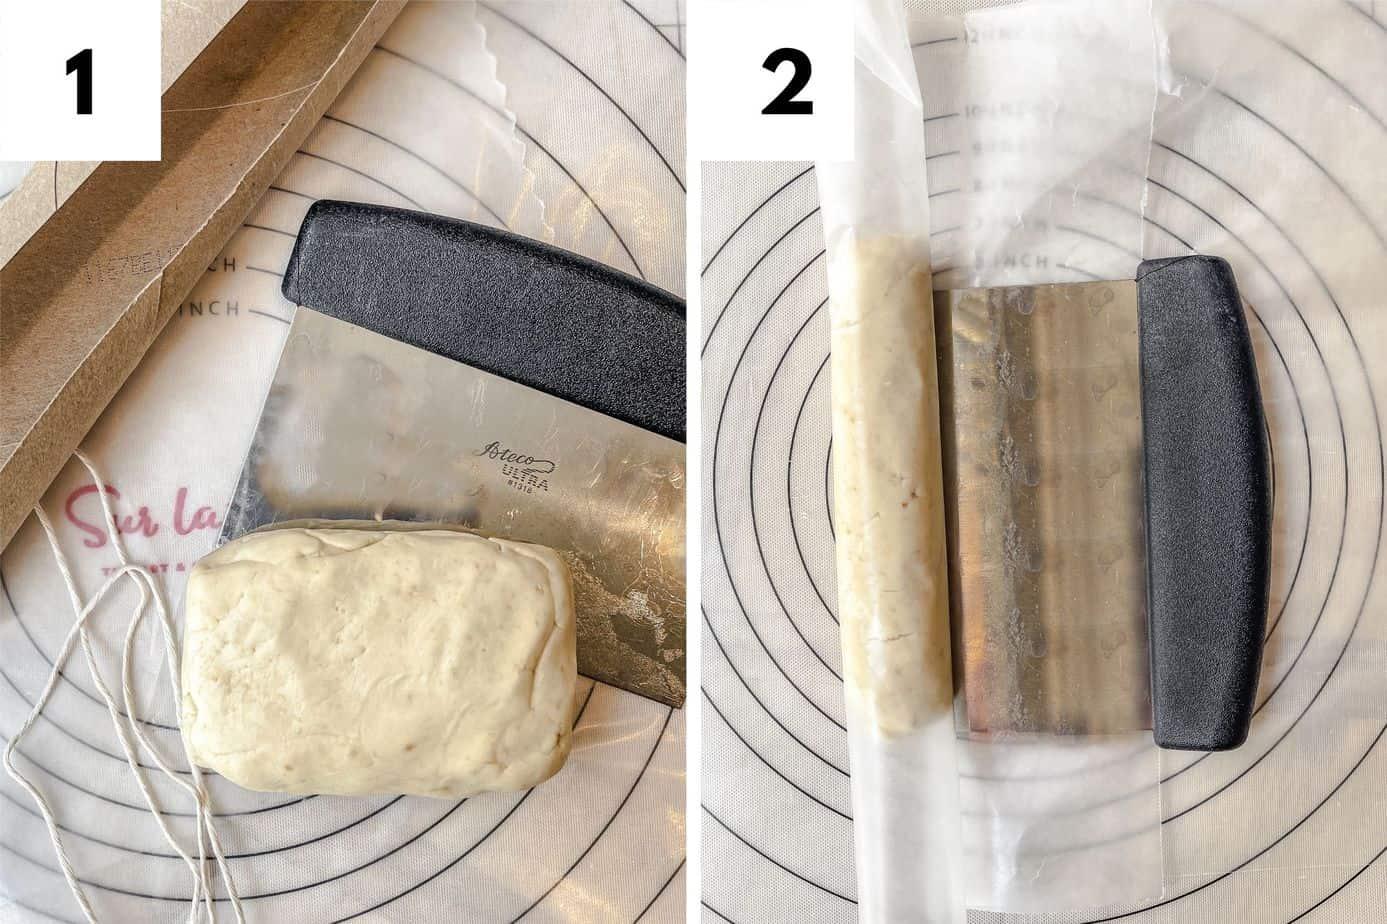 Steps 1 and 2 in Making Shortbread Tea Cookies